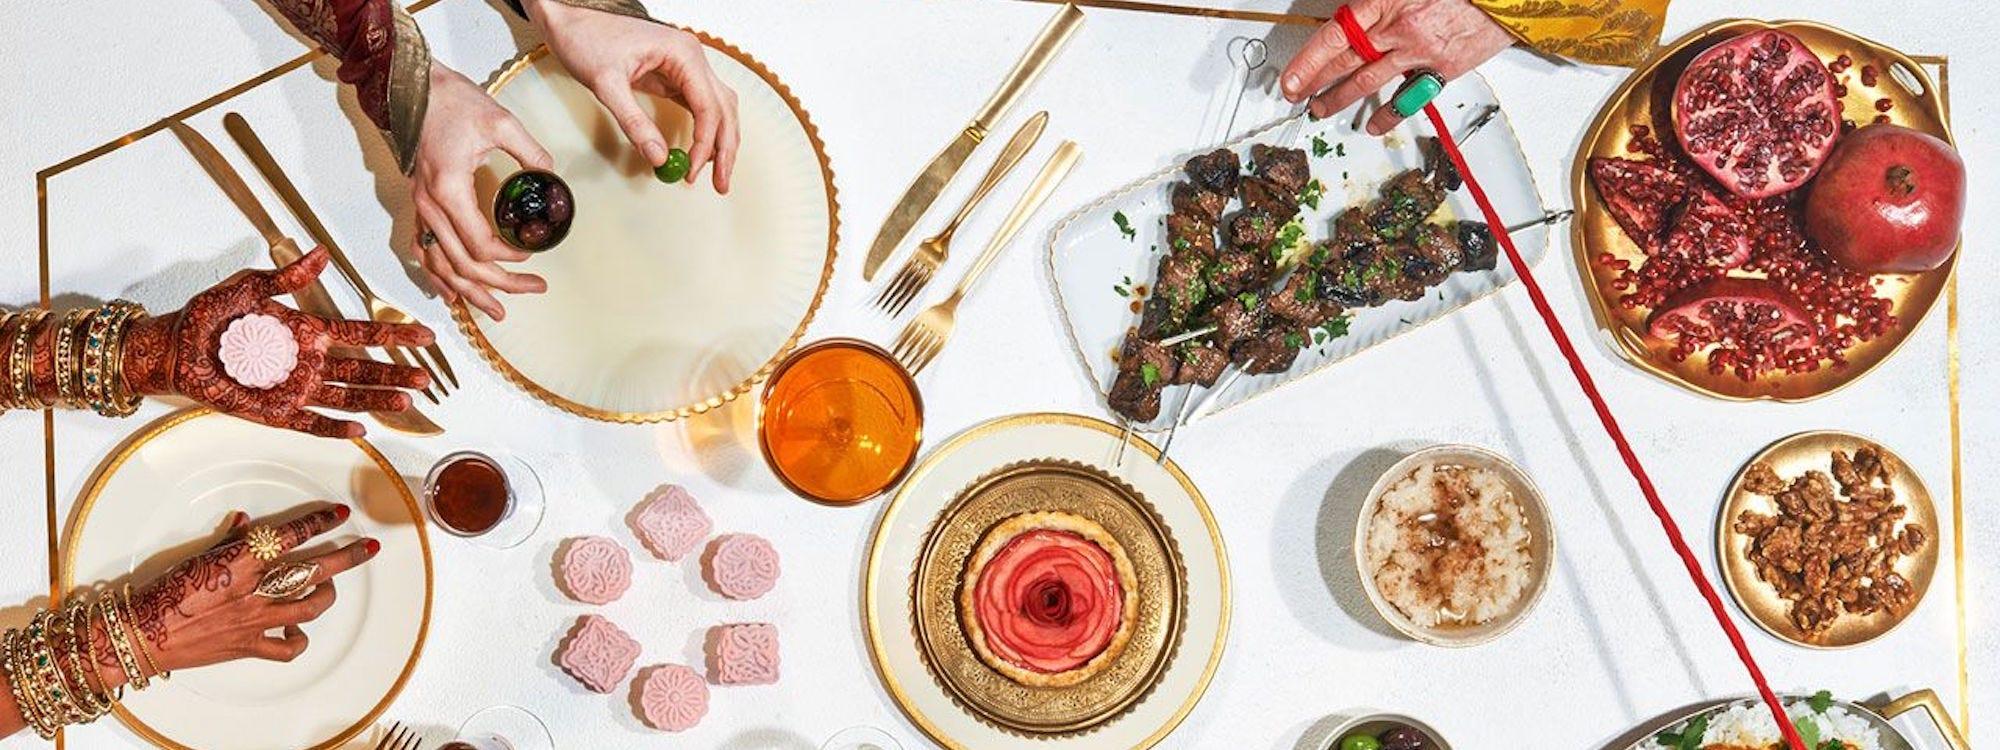 valentine u0027s day recipes romantic dinner ideas